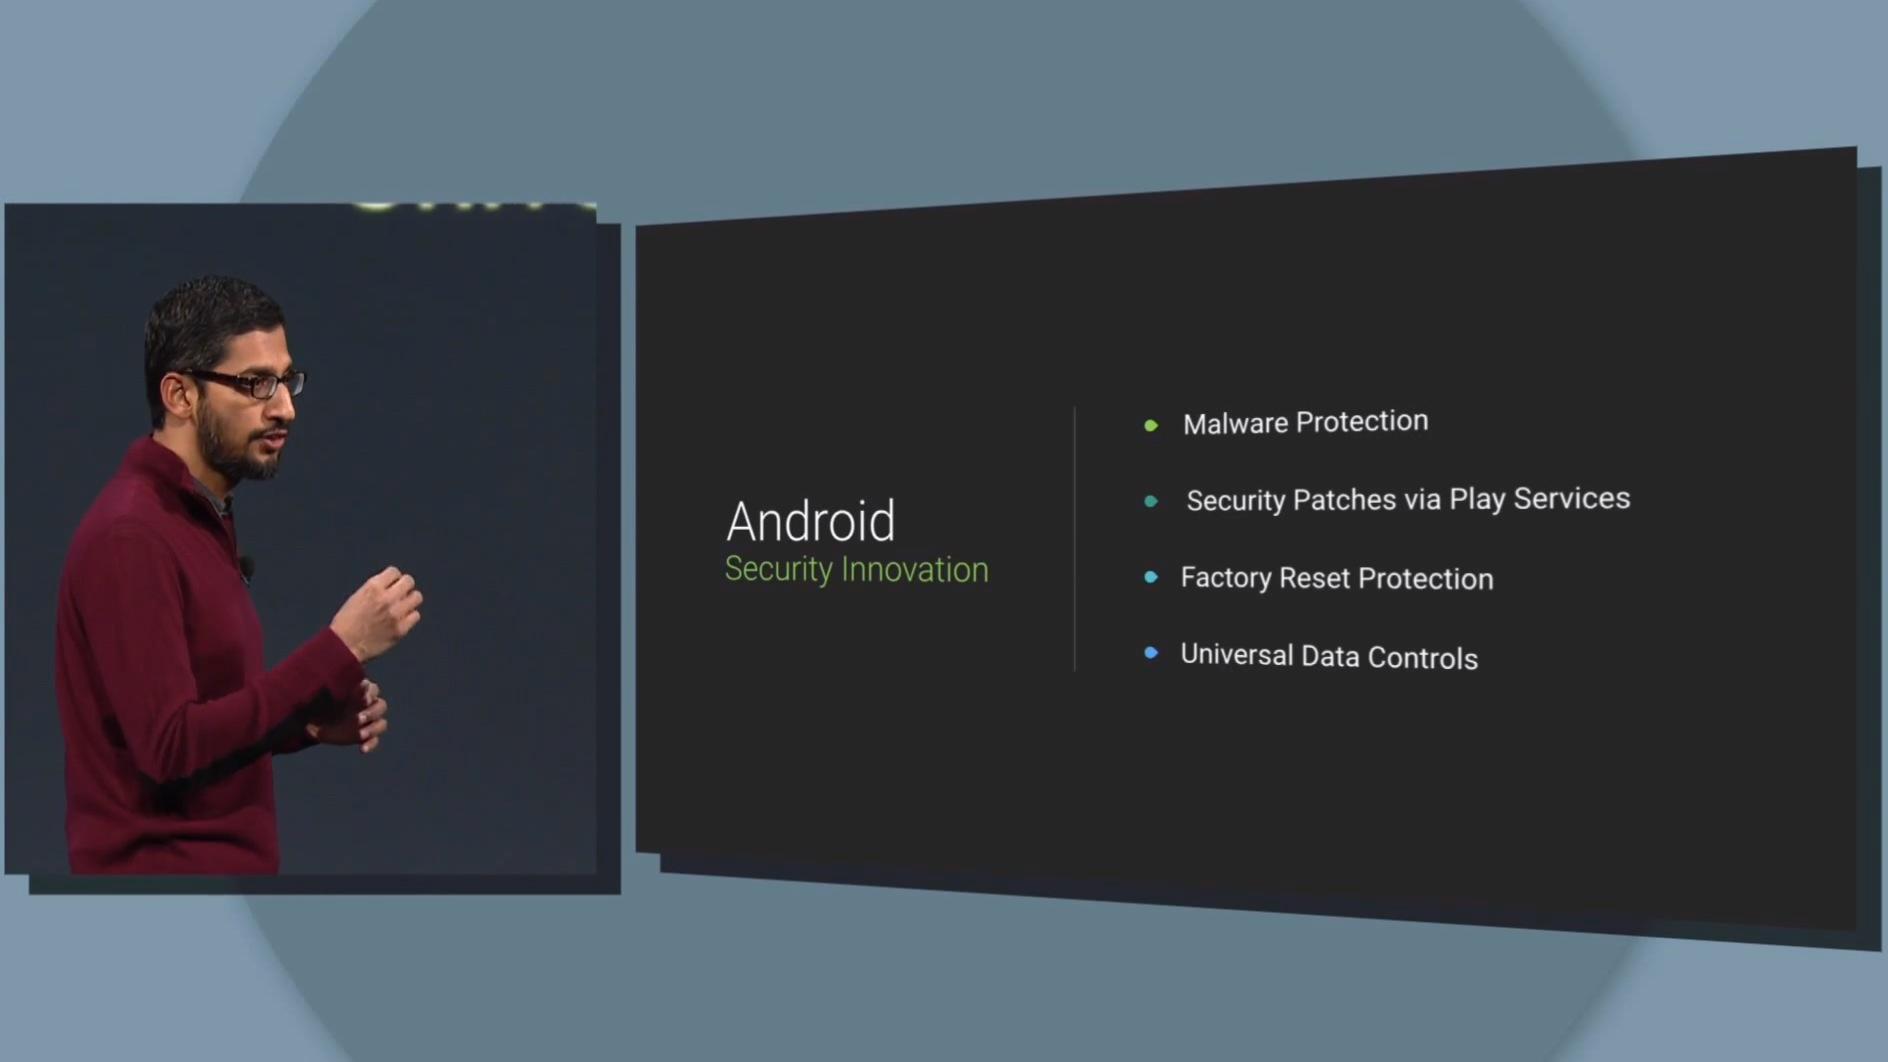 android-leentjebuur2014-veiligheid